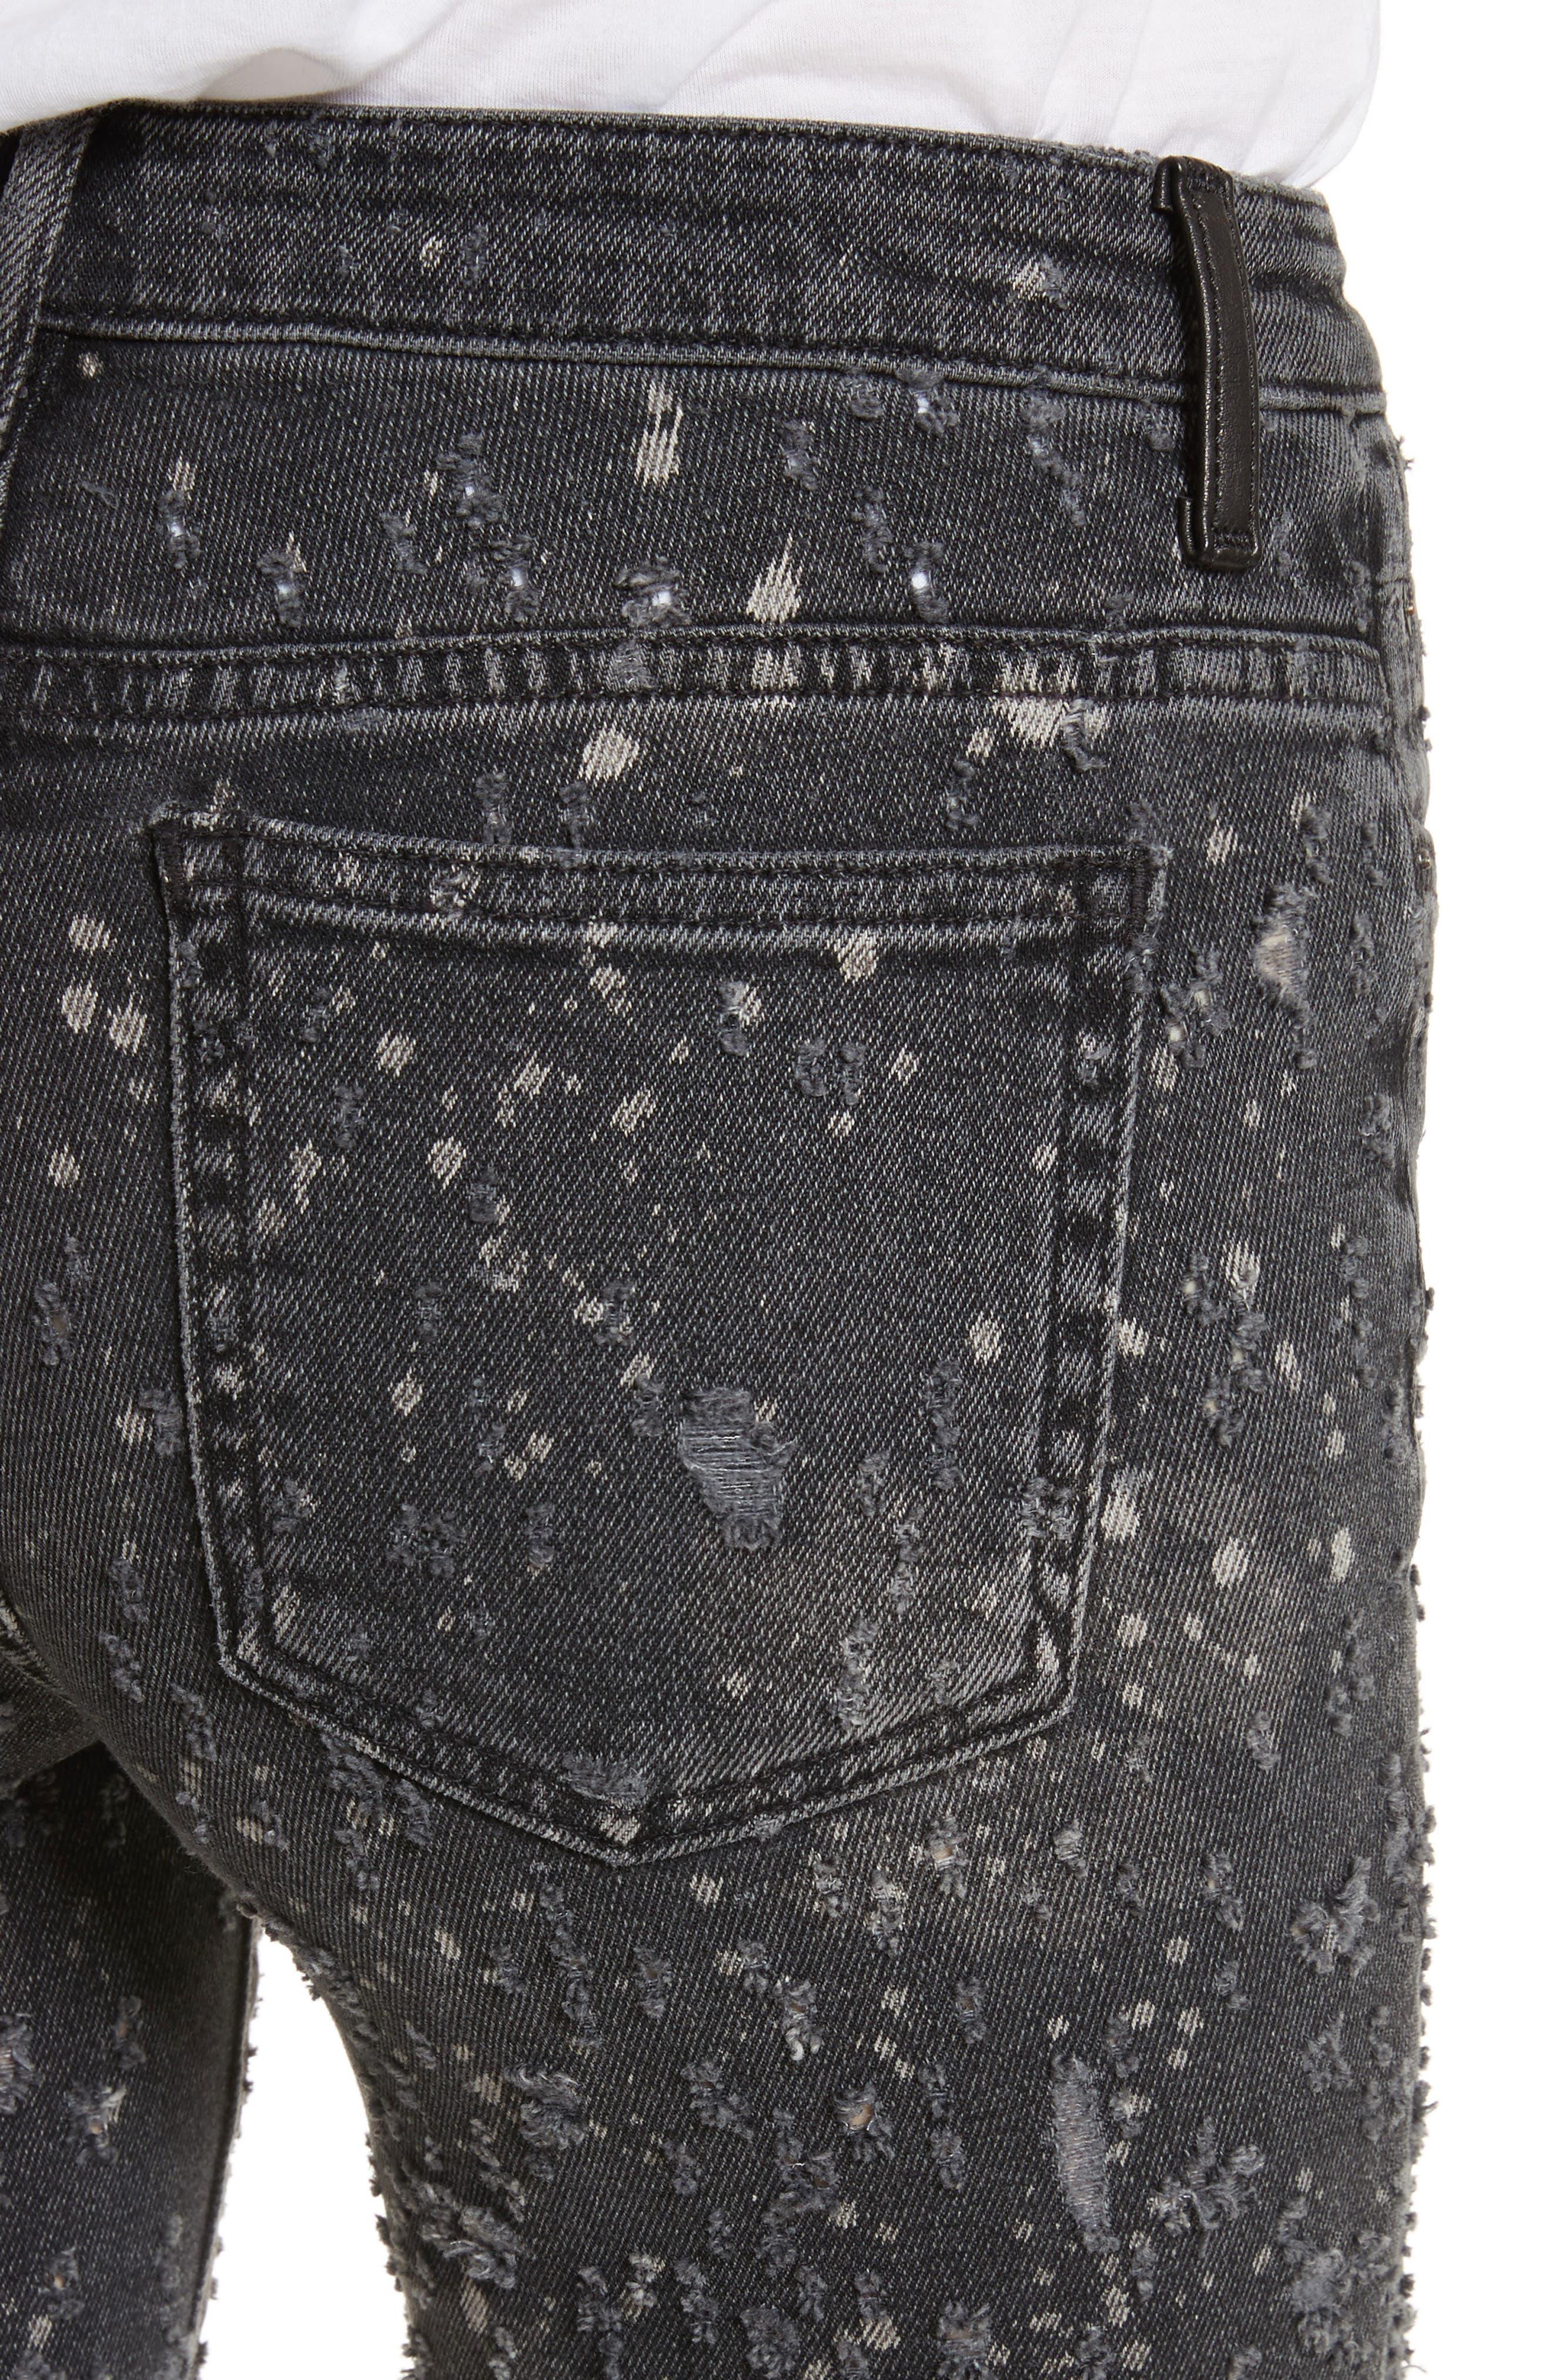 Denim X Alexander Wang Slim Destroyed Jeans,                             Alternate thumbnail 4, color,                             023